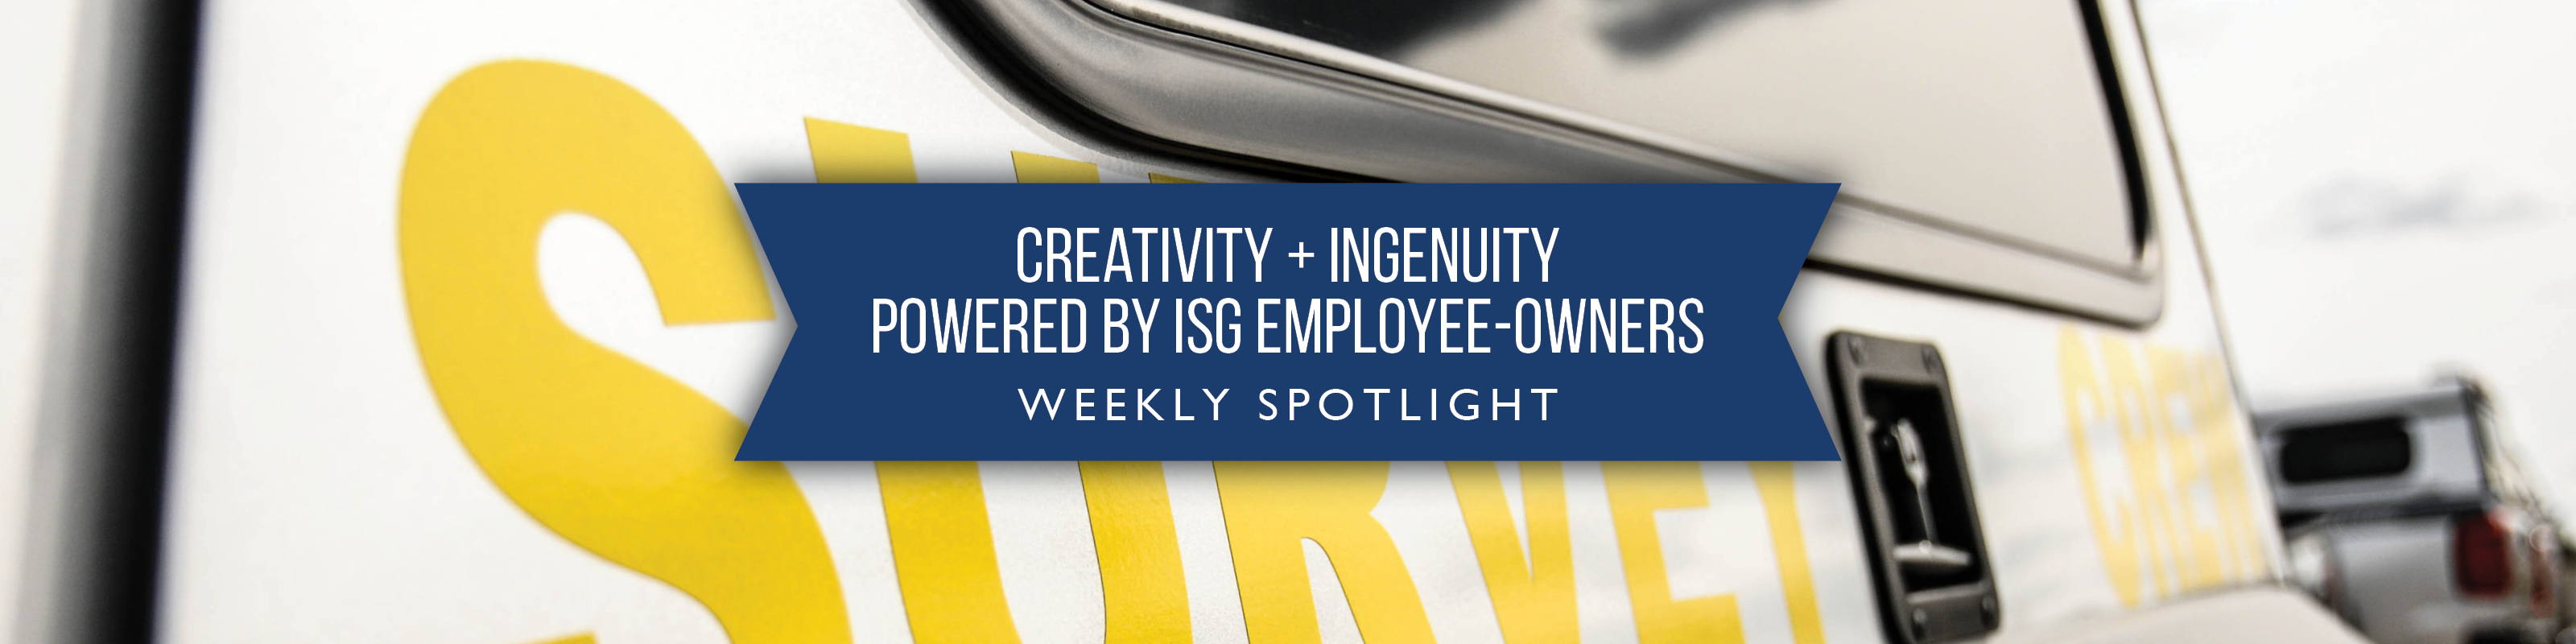 ISG Employee Spotlight graphic